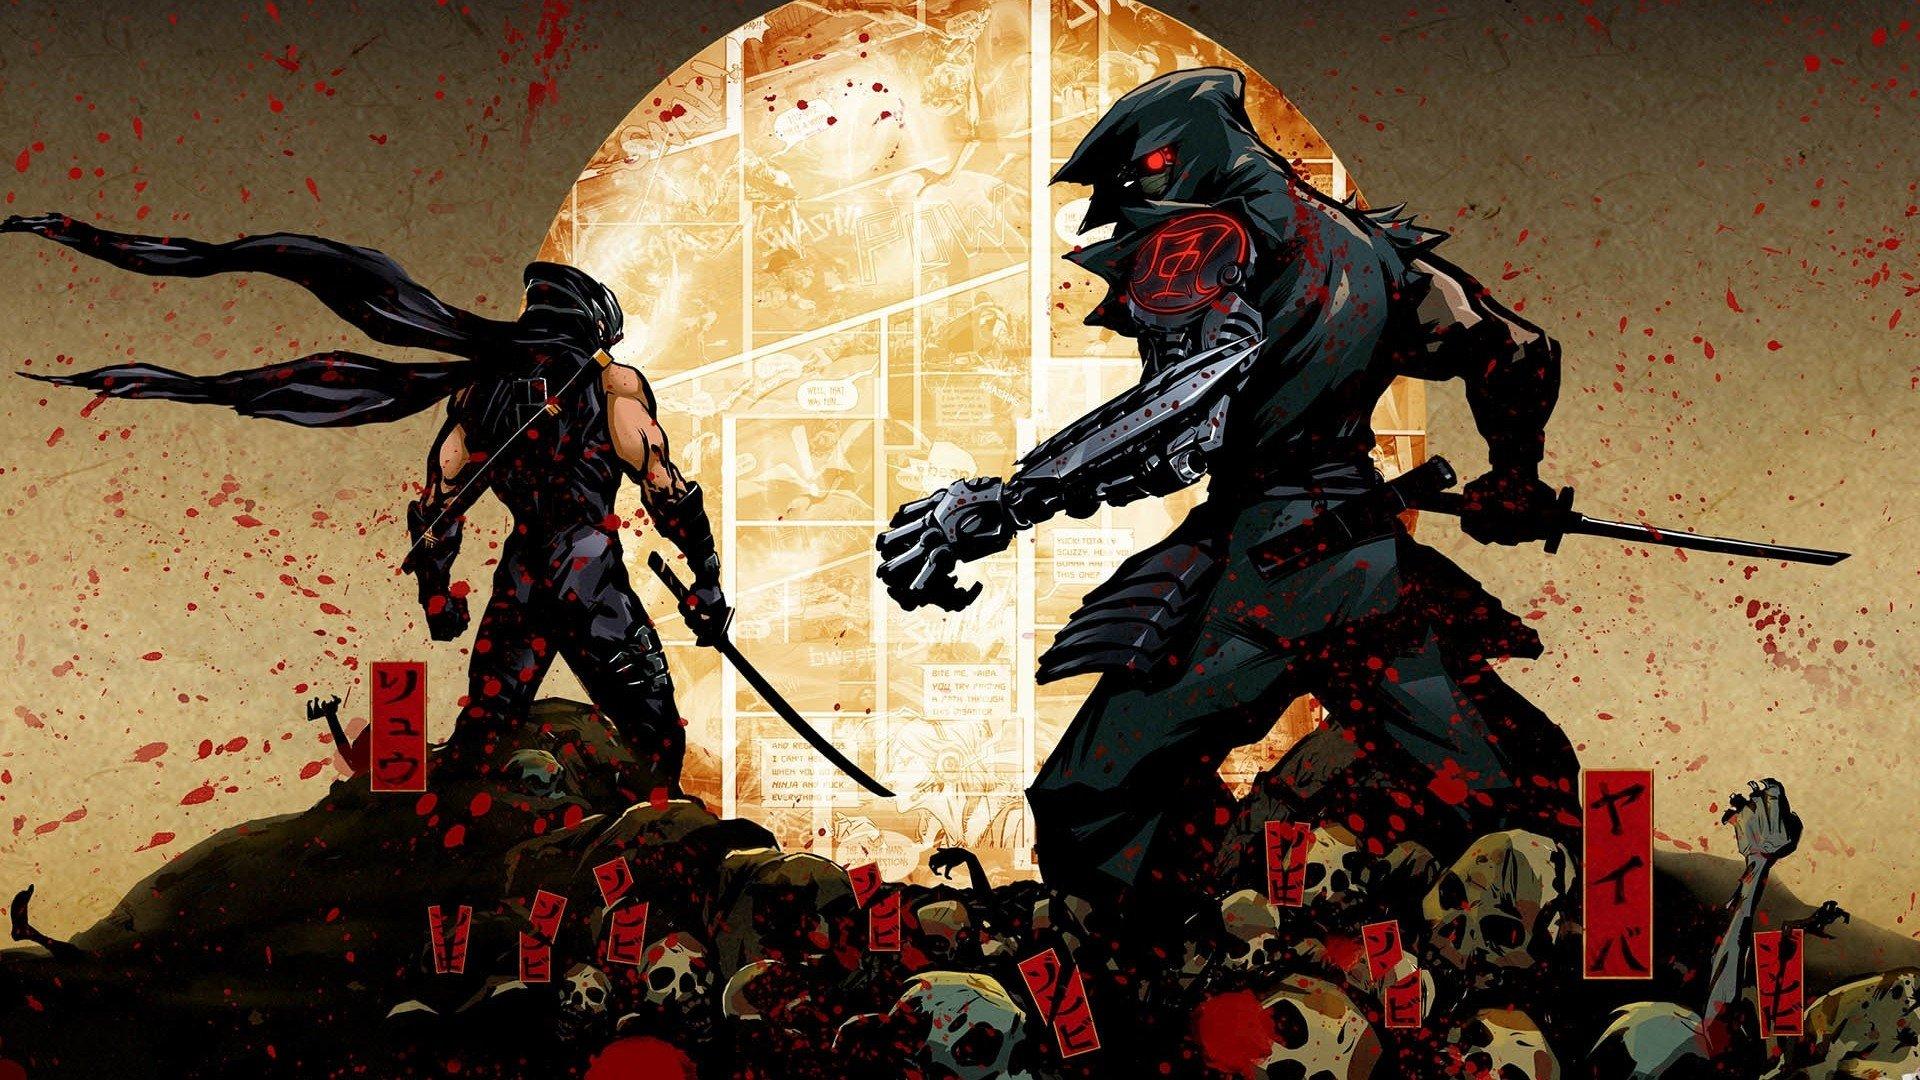 Yaiba Ninja Gaiden Wallpapers Video Game Hq Yaiba Ninja Gaiden Pictures 4k Wallpapers 2019